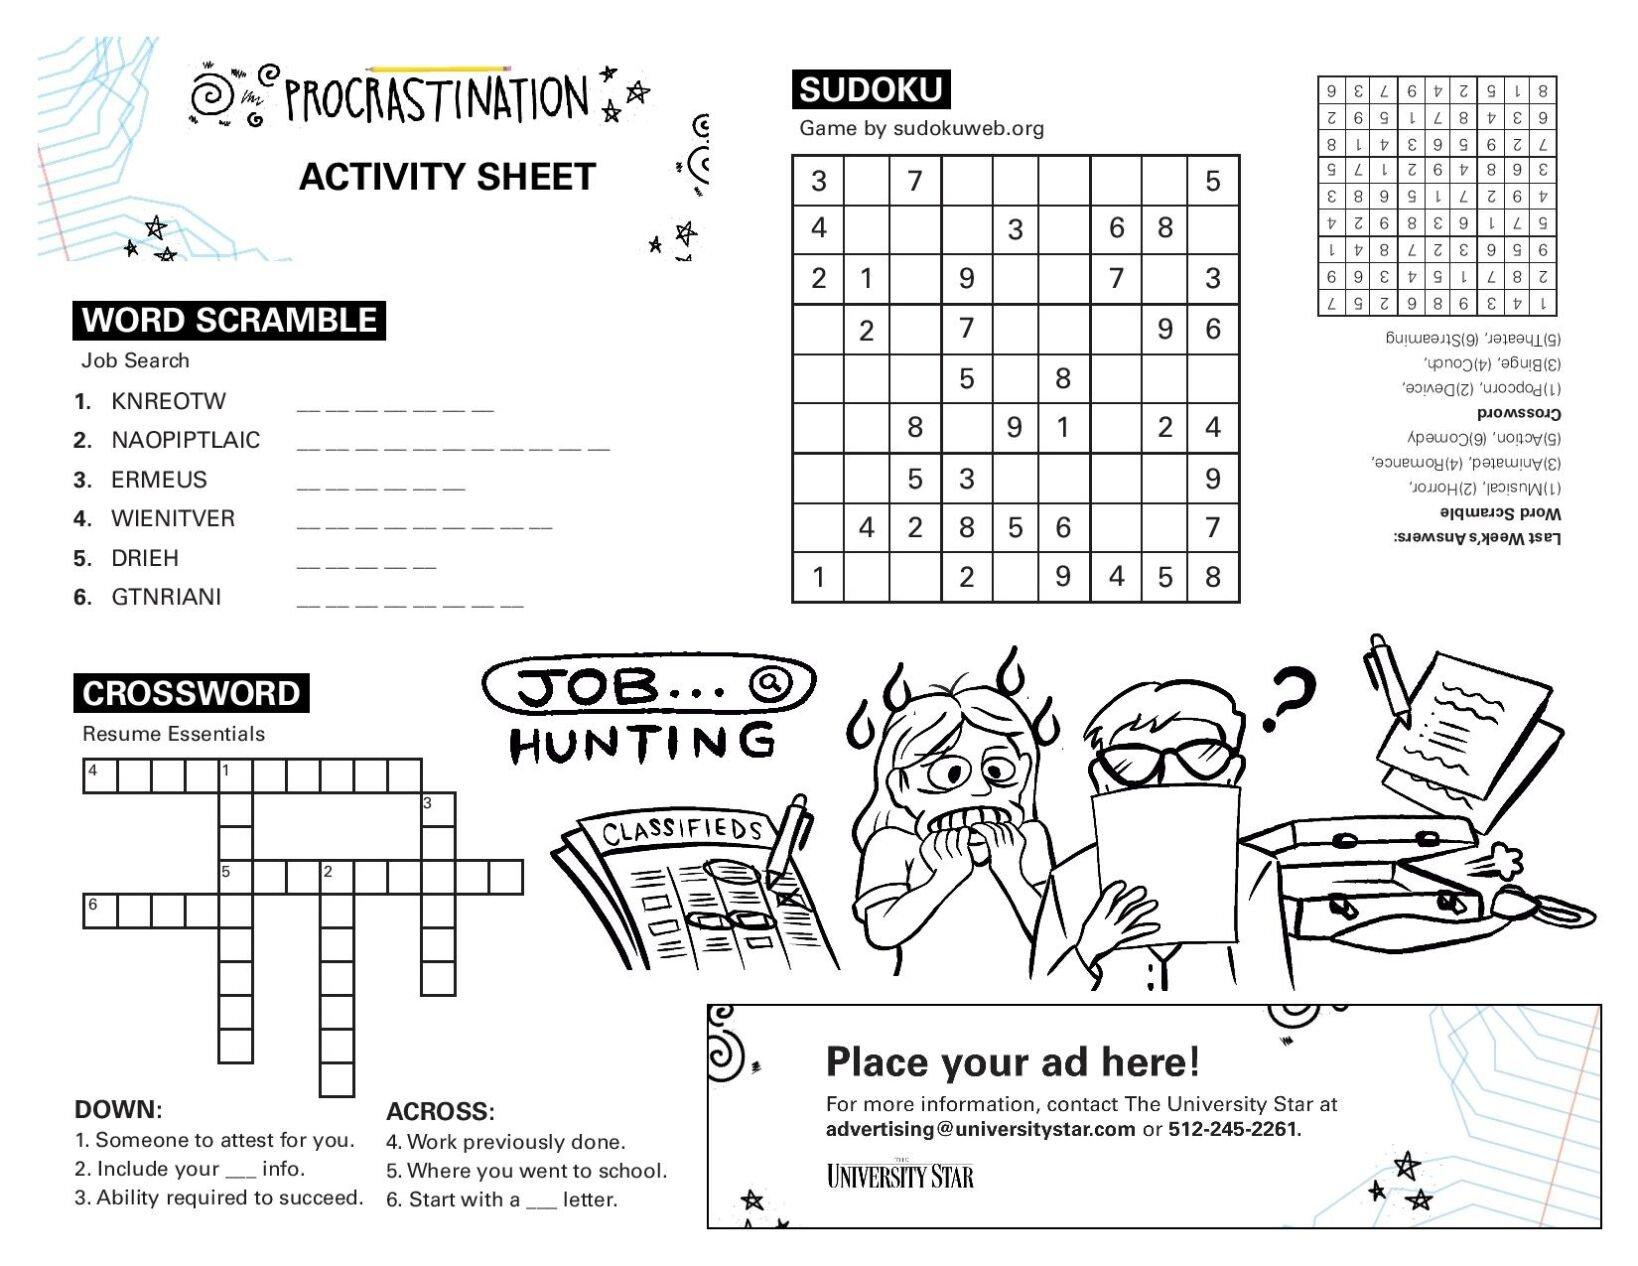 11/17 printable activity sheet.